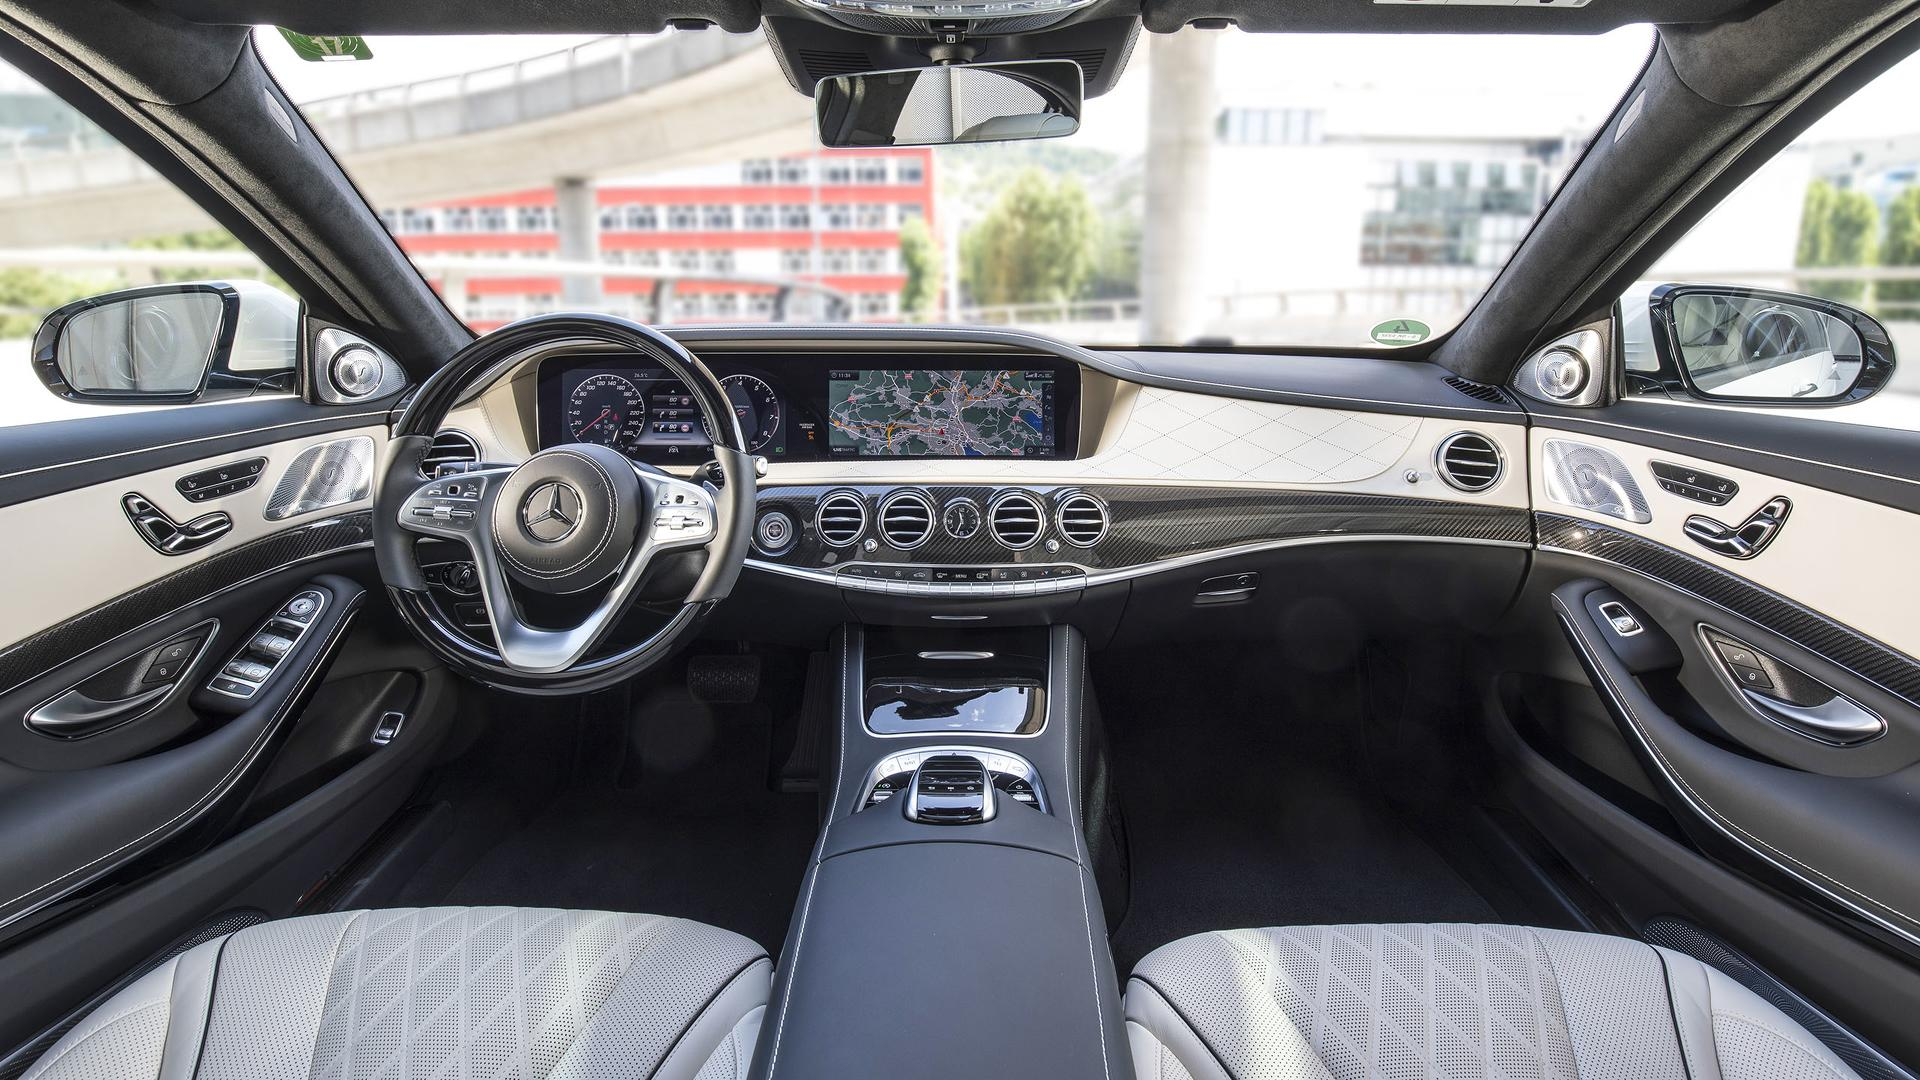 5a4ddec75e68d 2018 mercedes benz s class first drive ویژگی های مرسدس کلاس S   اجاره ماشین